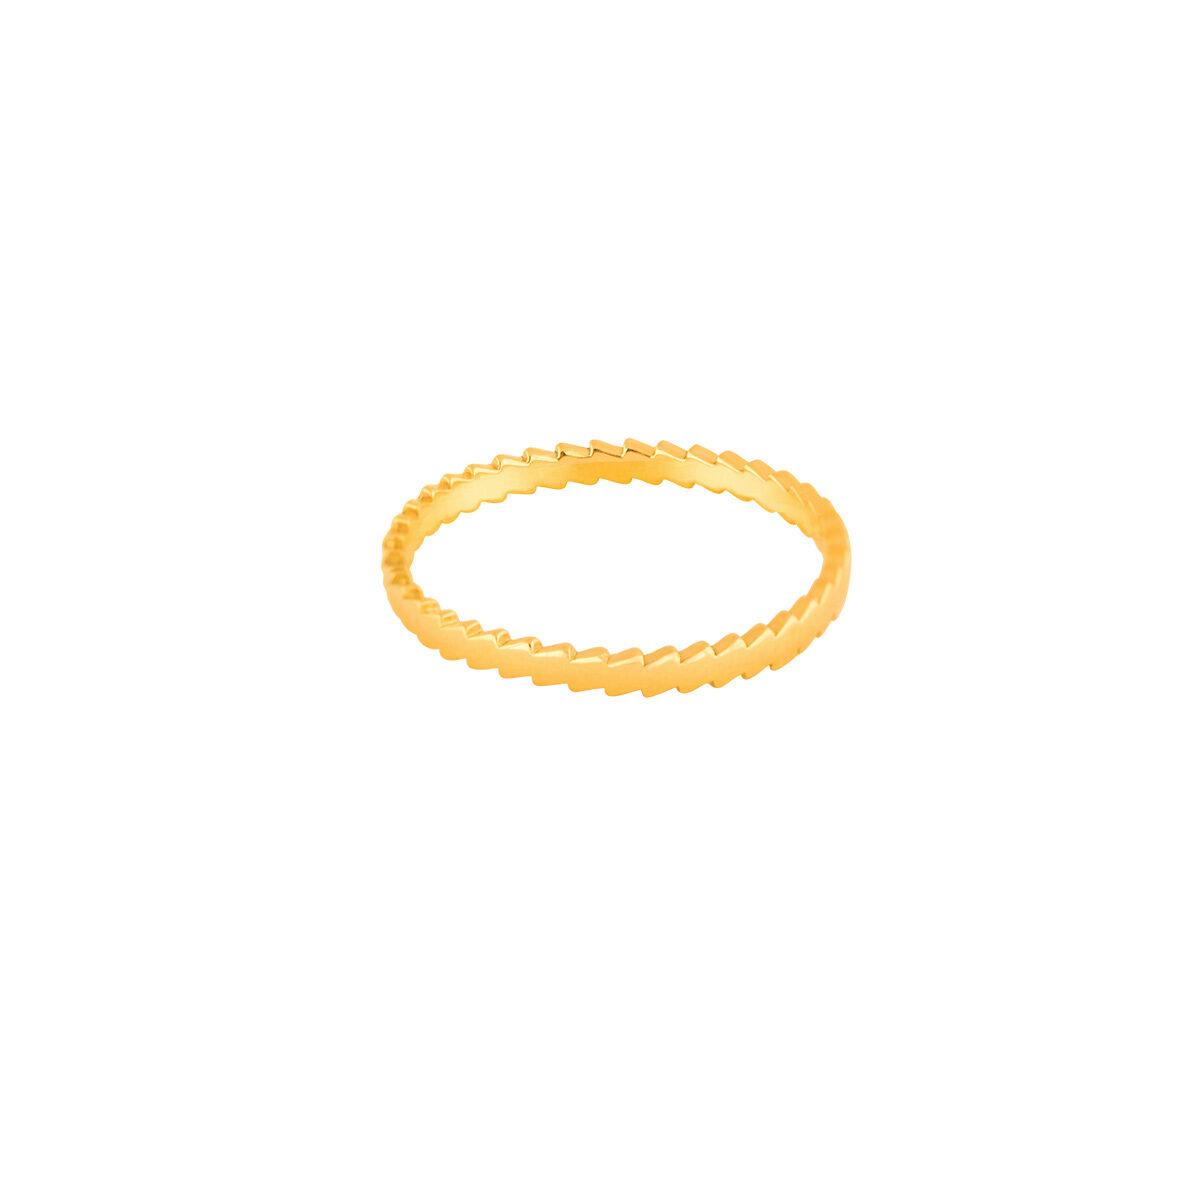 انگشتر طلا زیگزاک پرسته